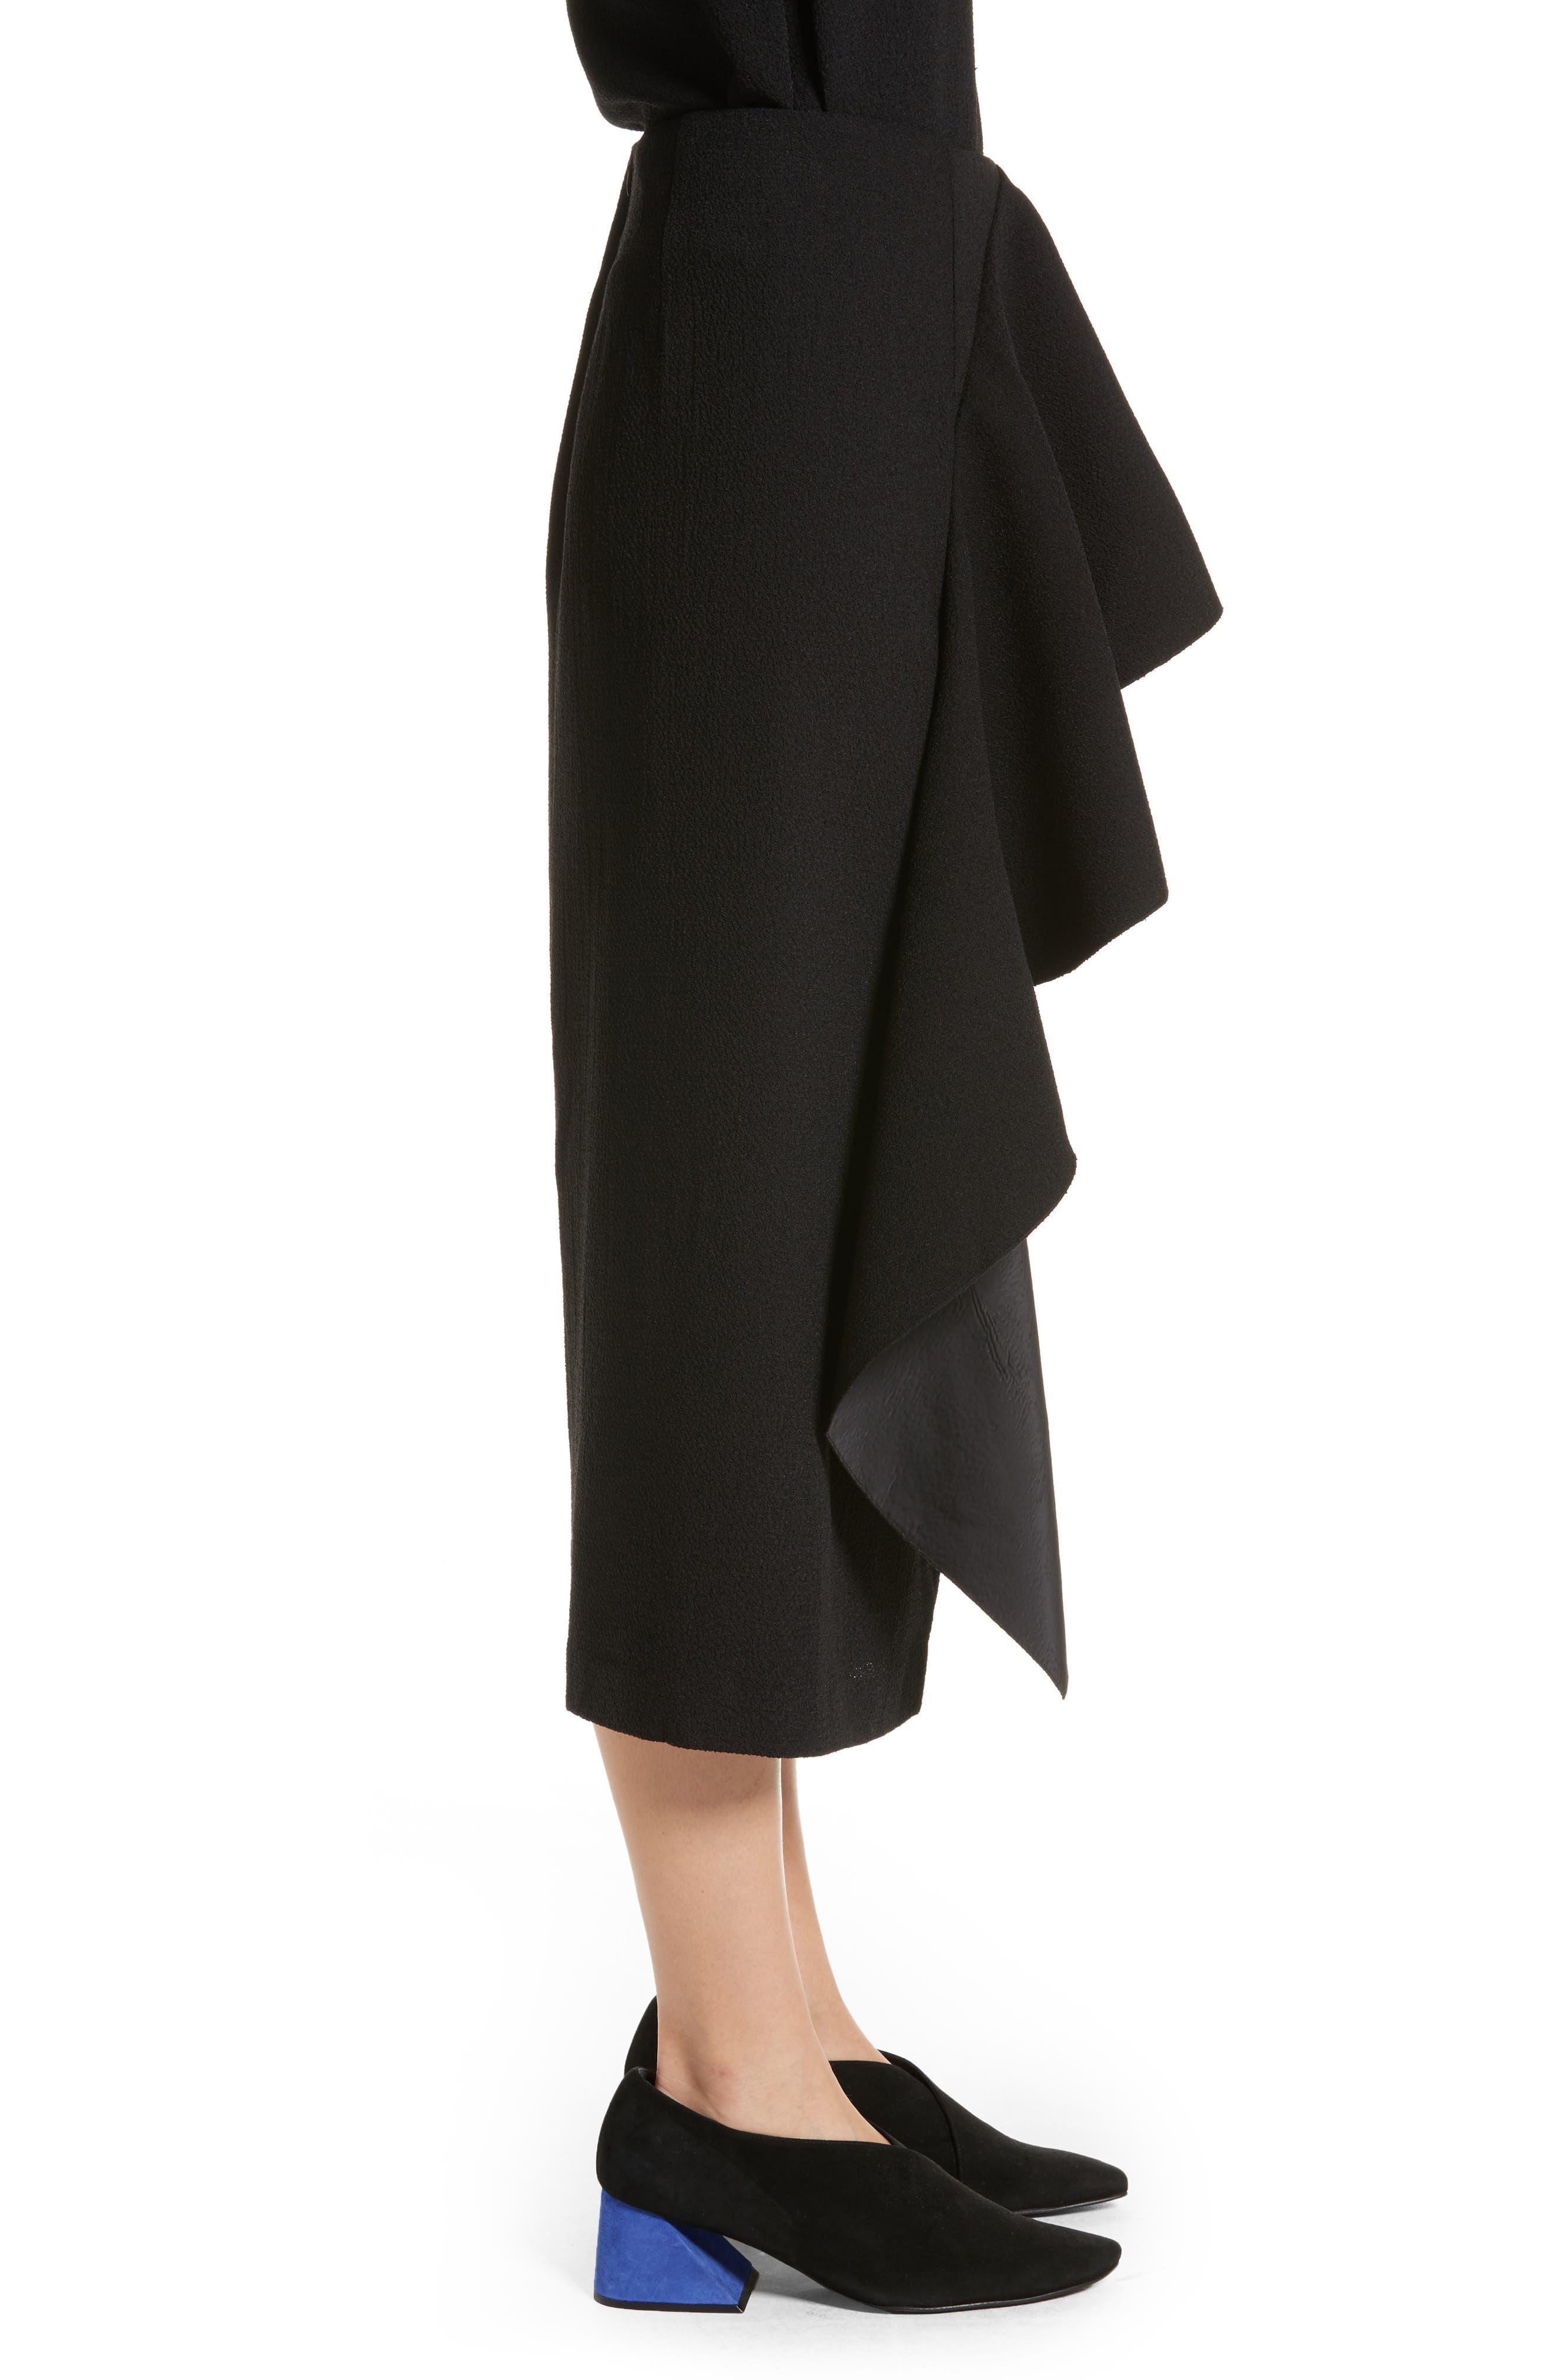 Alternate Image 3  - Rejina Pyo Maude Ruffle Panel Crepe Skirt (Nordstrom Exclusive)